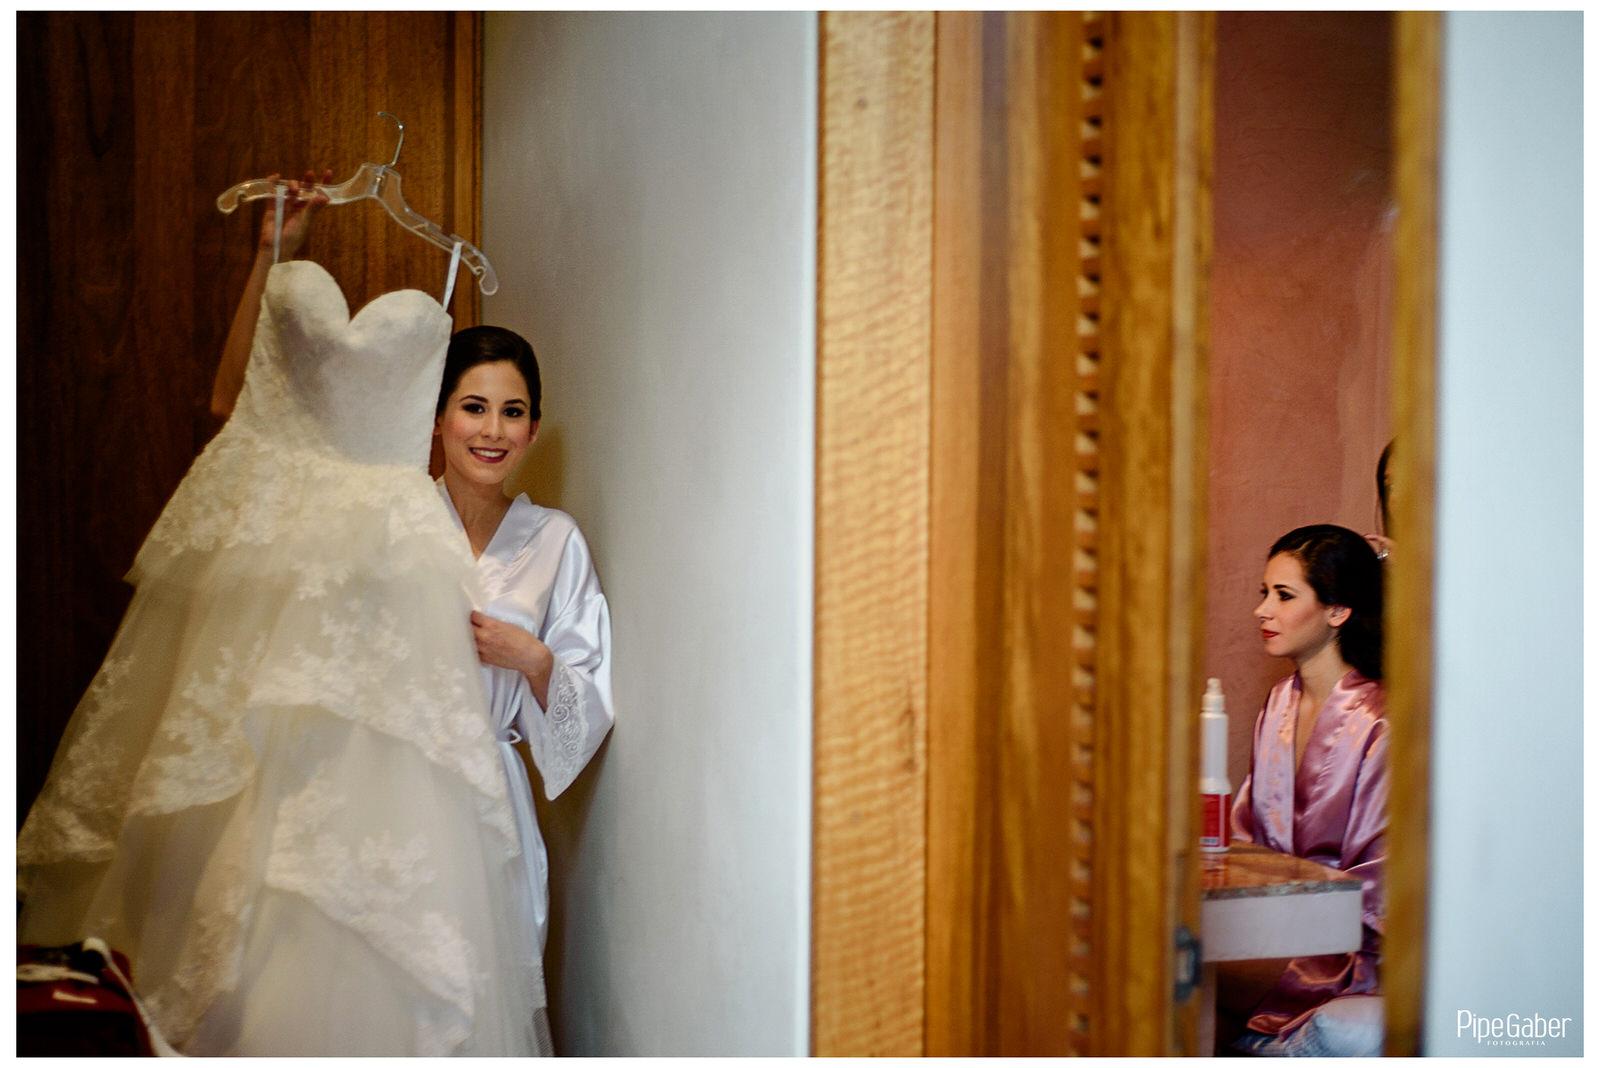 Boda_destino_yucatan_monterrey_fotograf_wedding_photographer_003.JPG